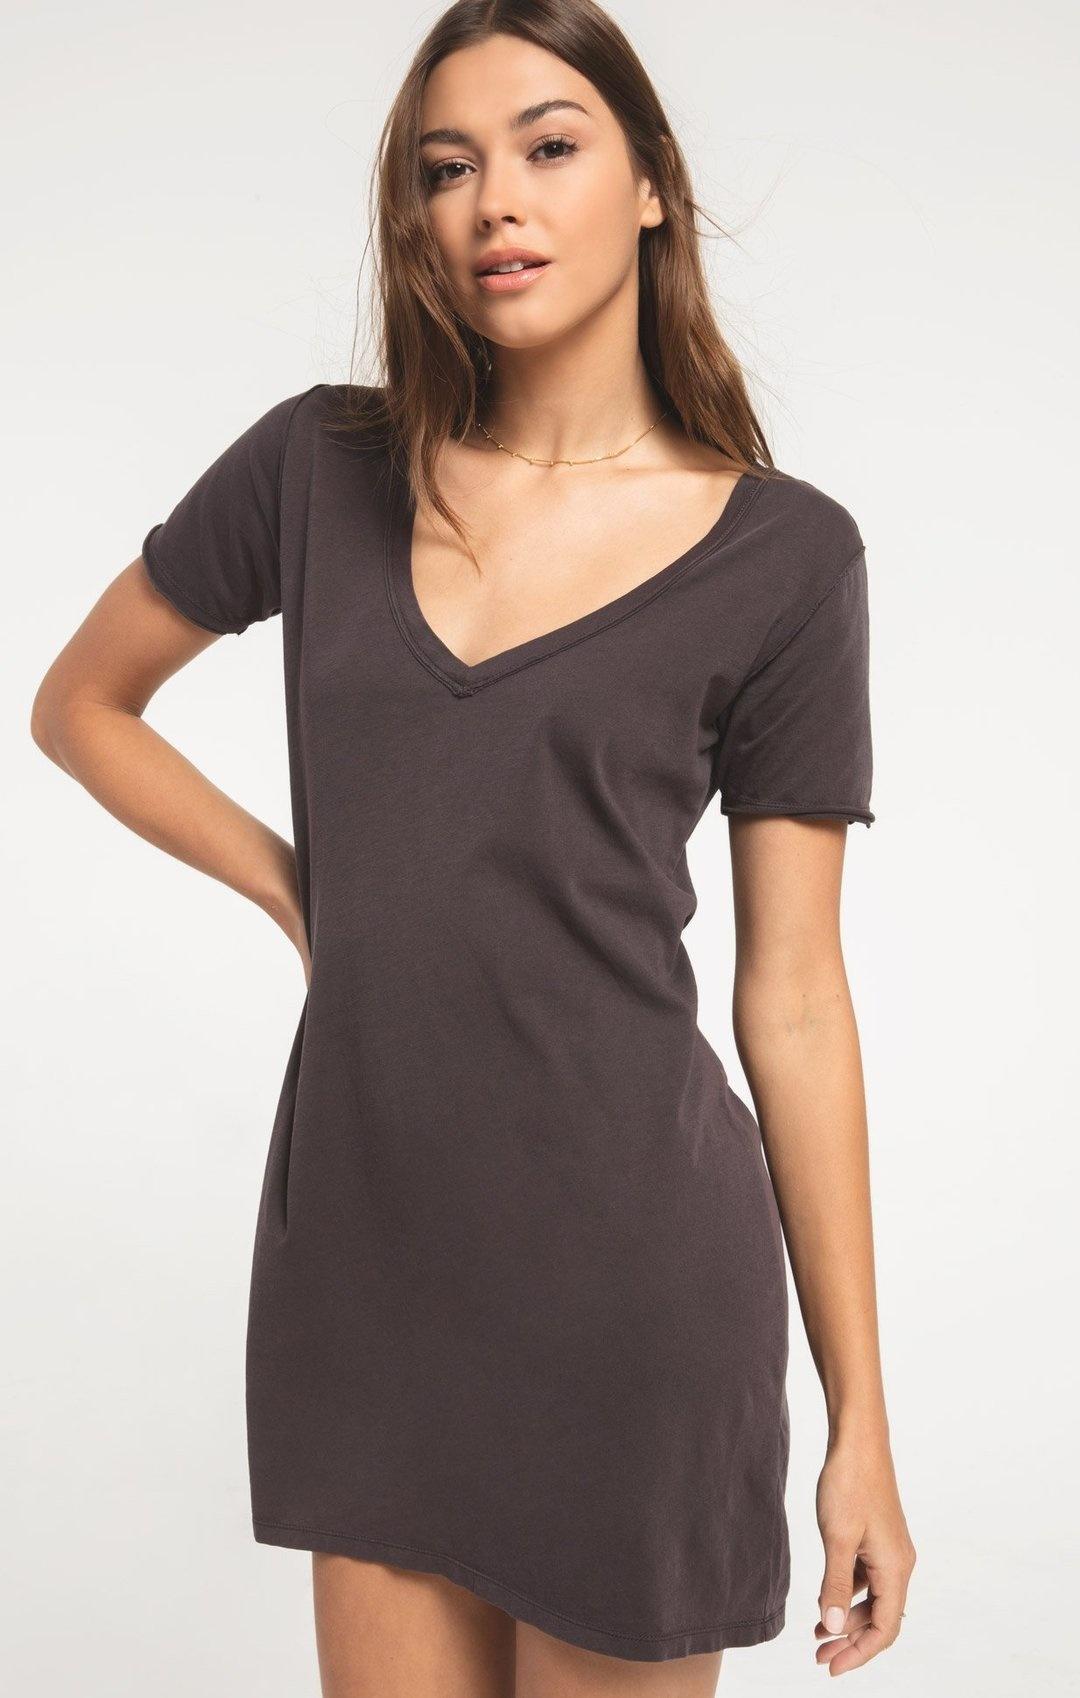 Z Supply Organic Cotton Tee Dress